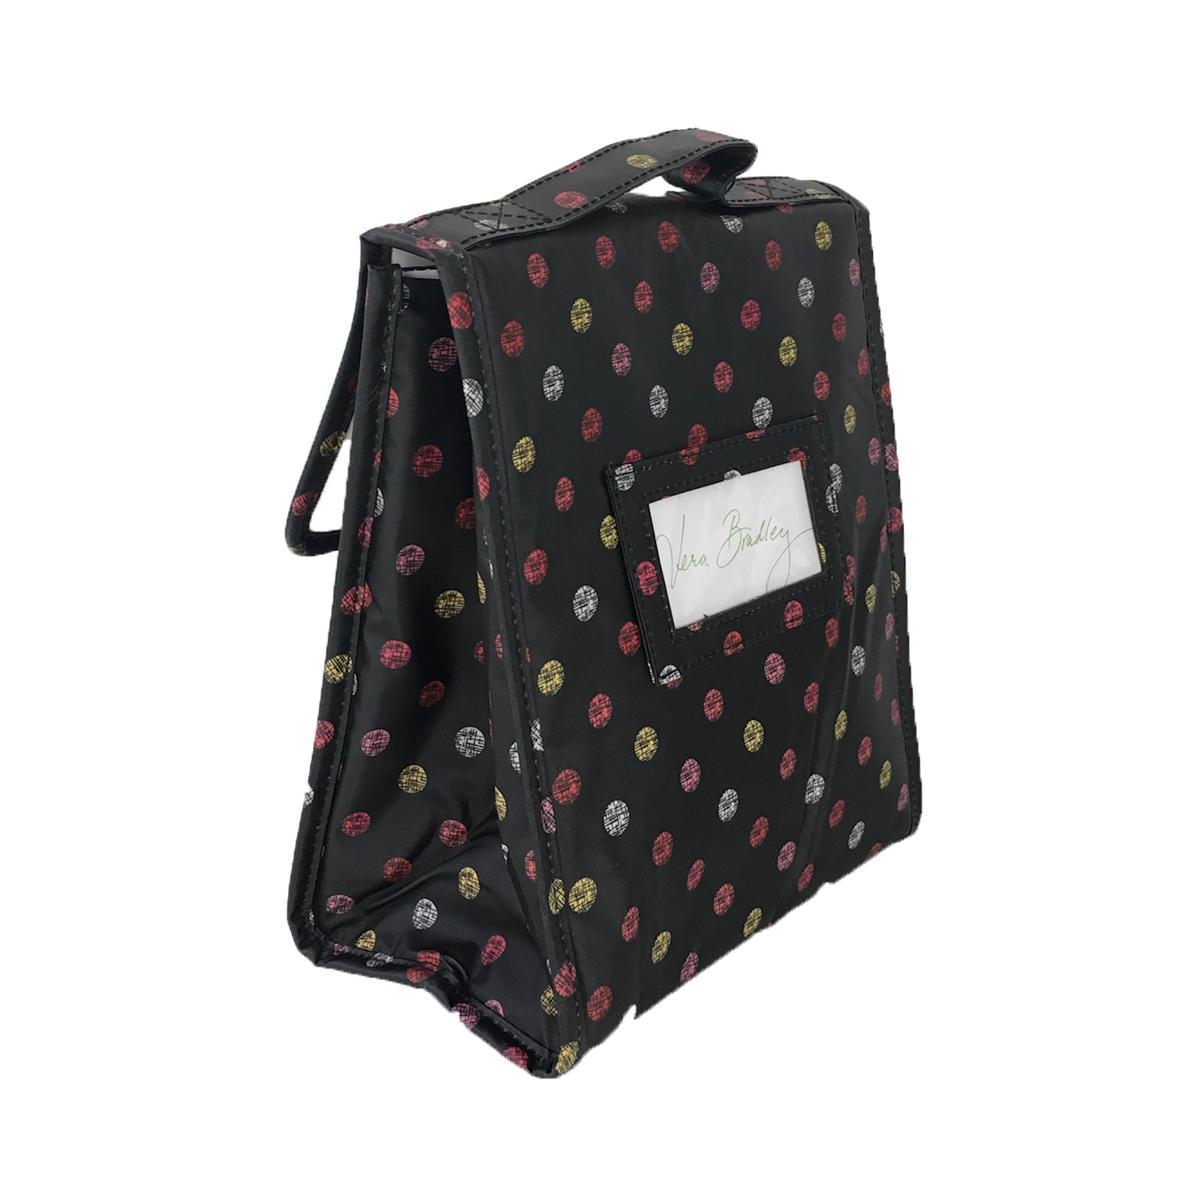 5d7d9b0db2 Vera Bradley Lunch Sack Insulated Lunch Bag